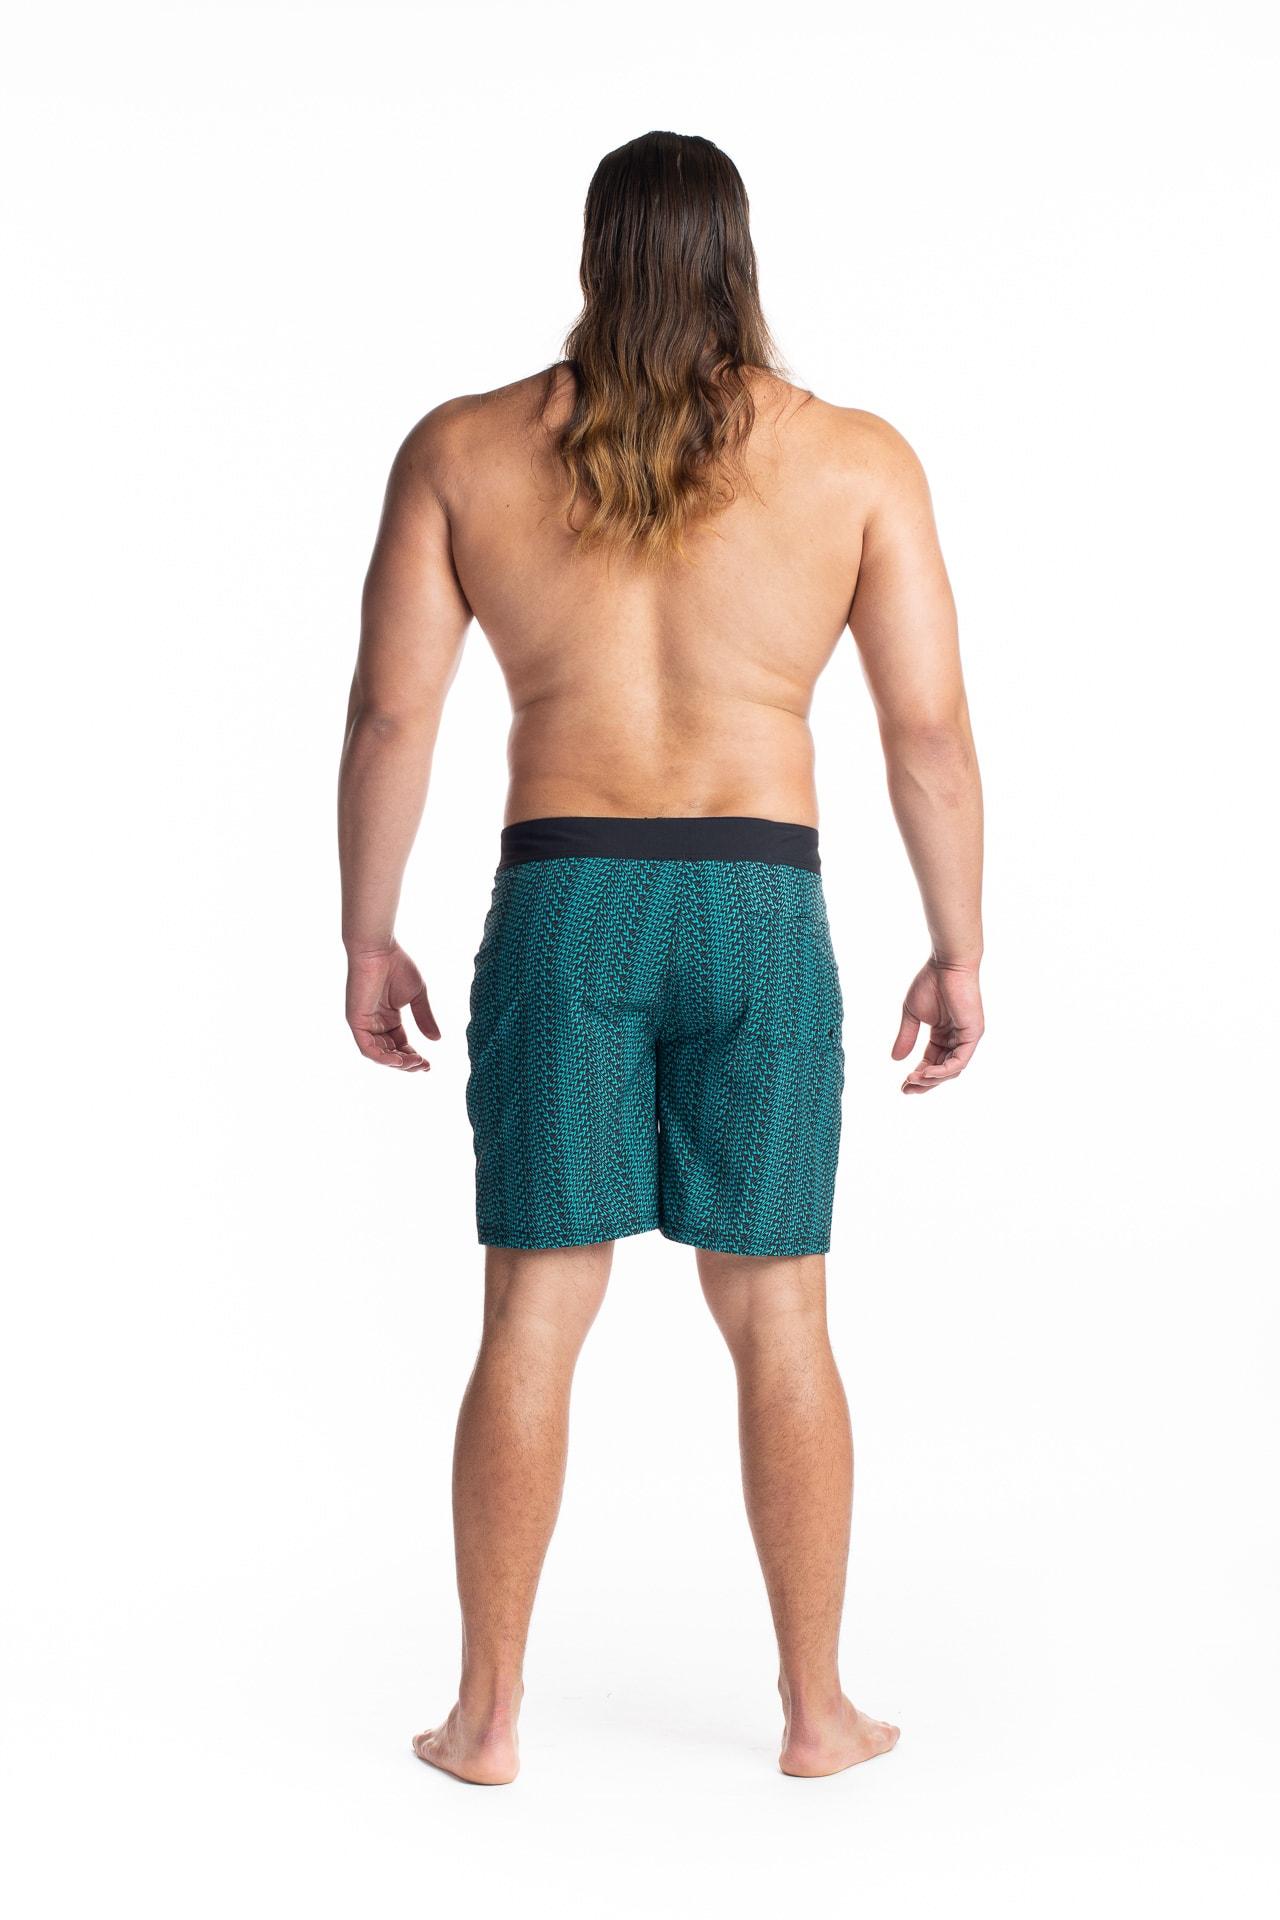 Male model wearing 4 Way Stretch in Black Jade Niau - Black View